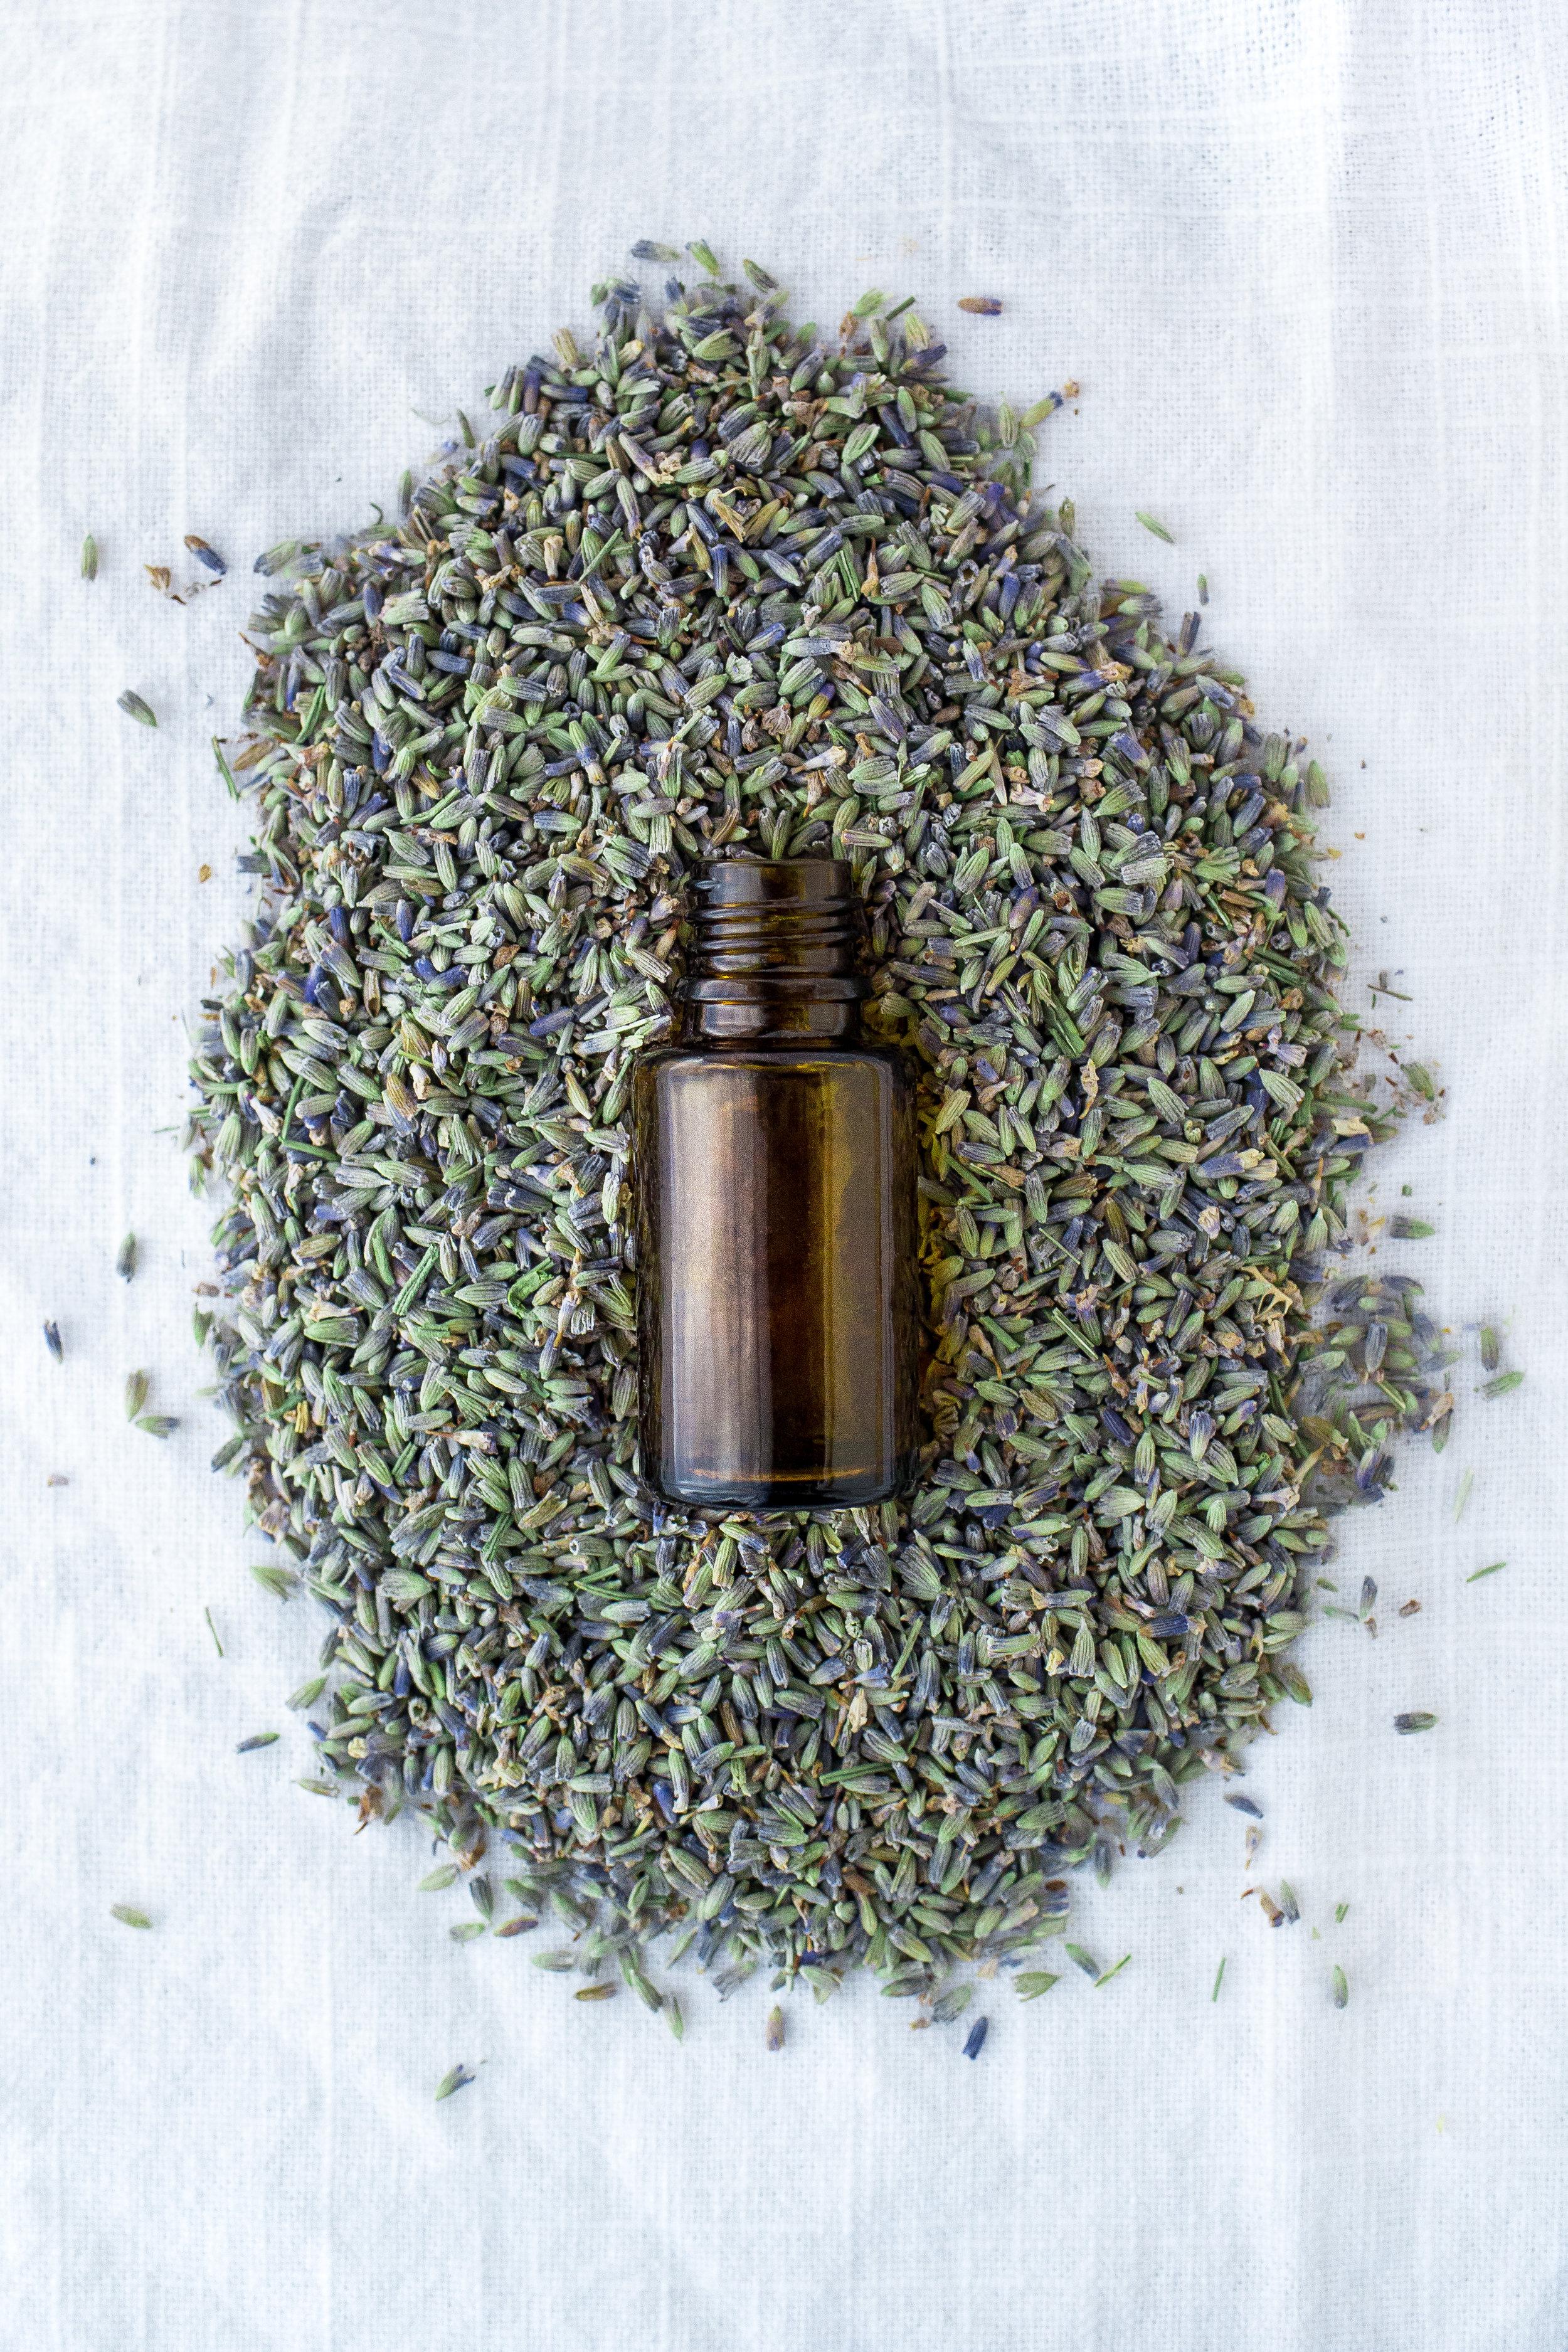 Essential Lavender-Laura Olsen.JPG